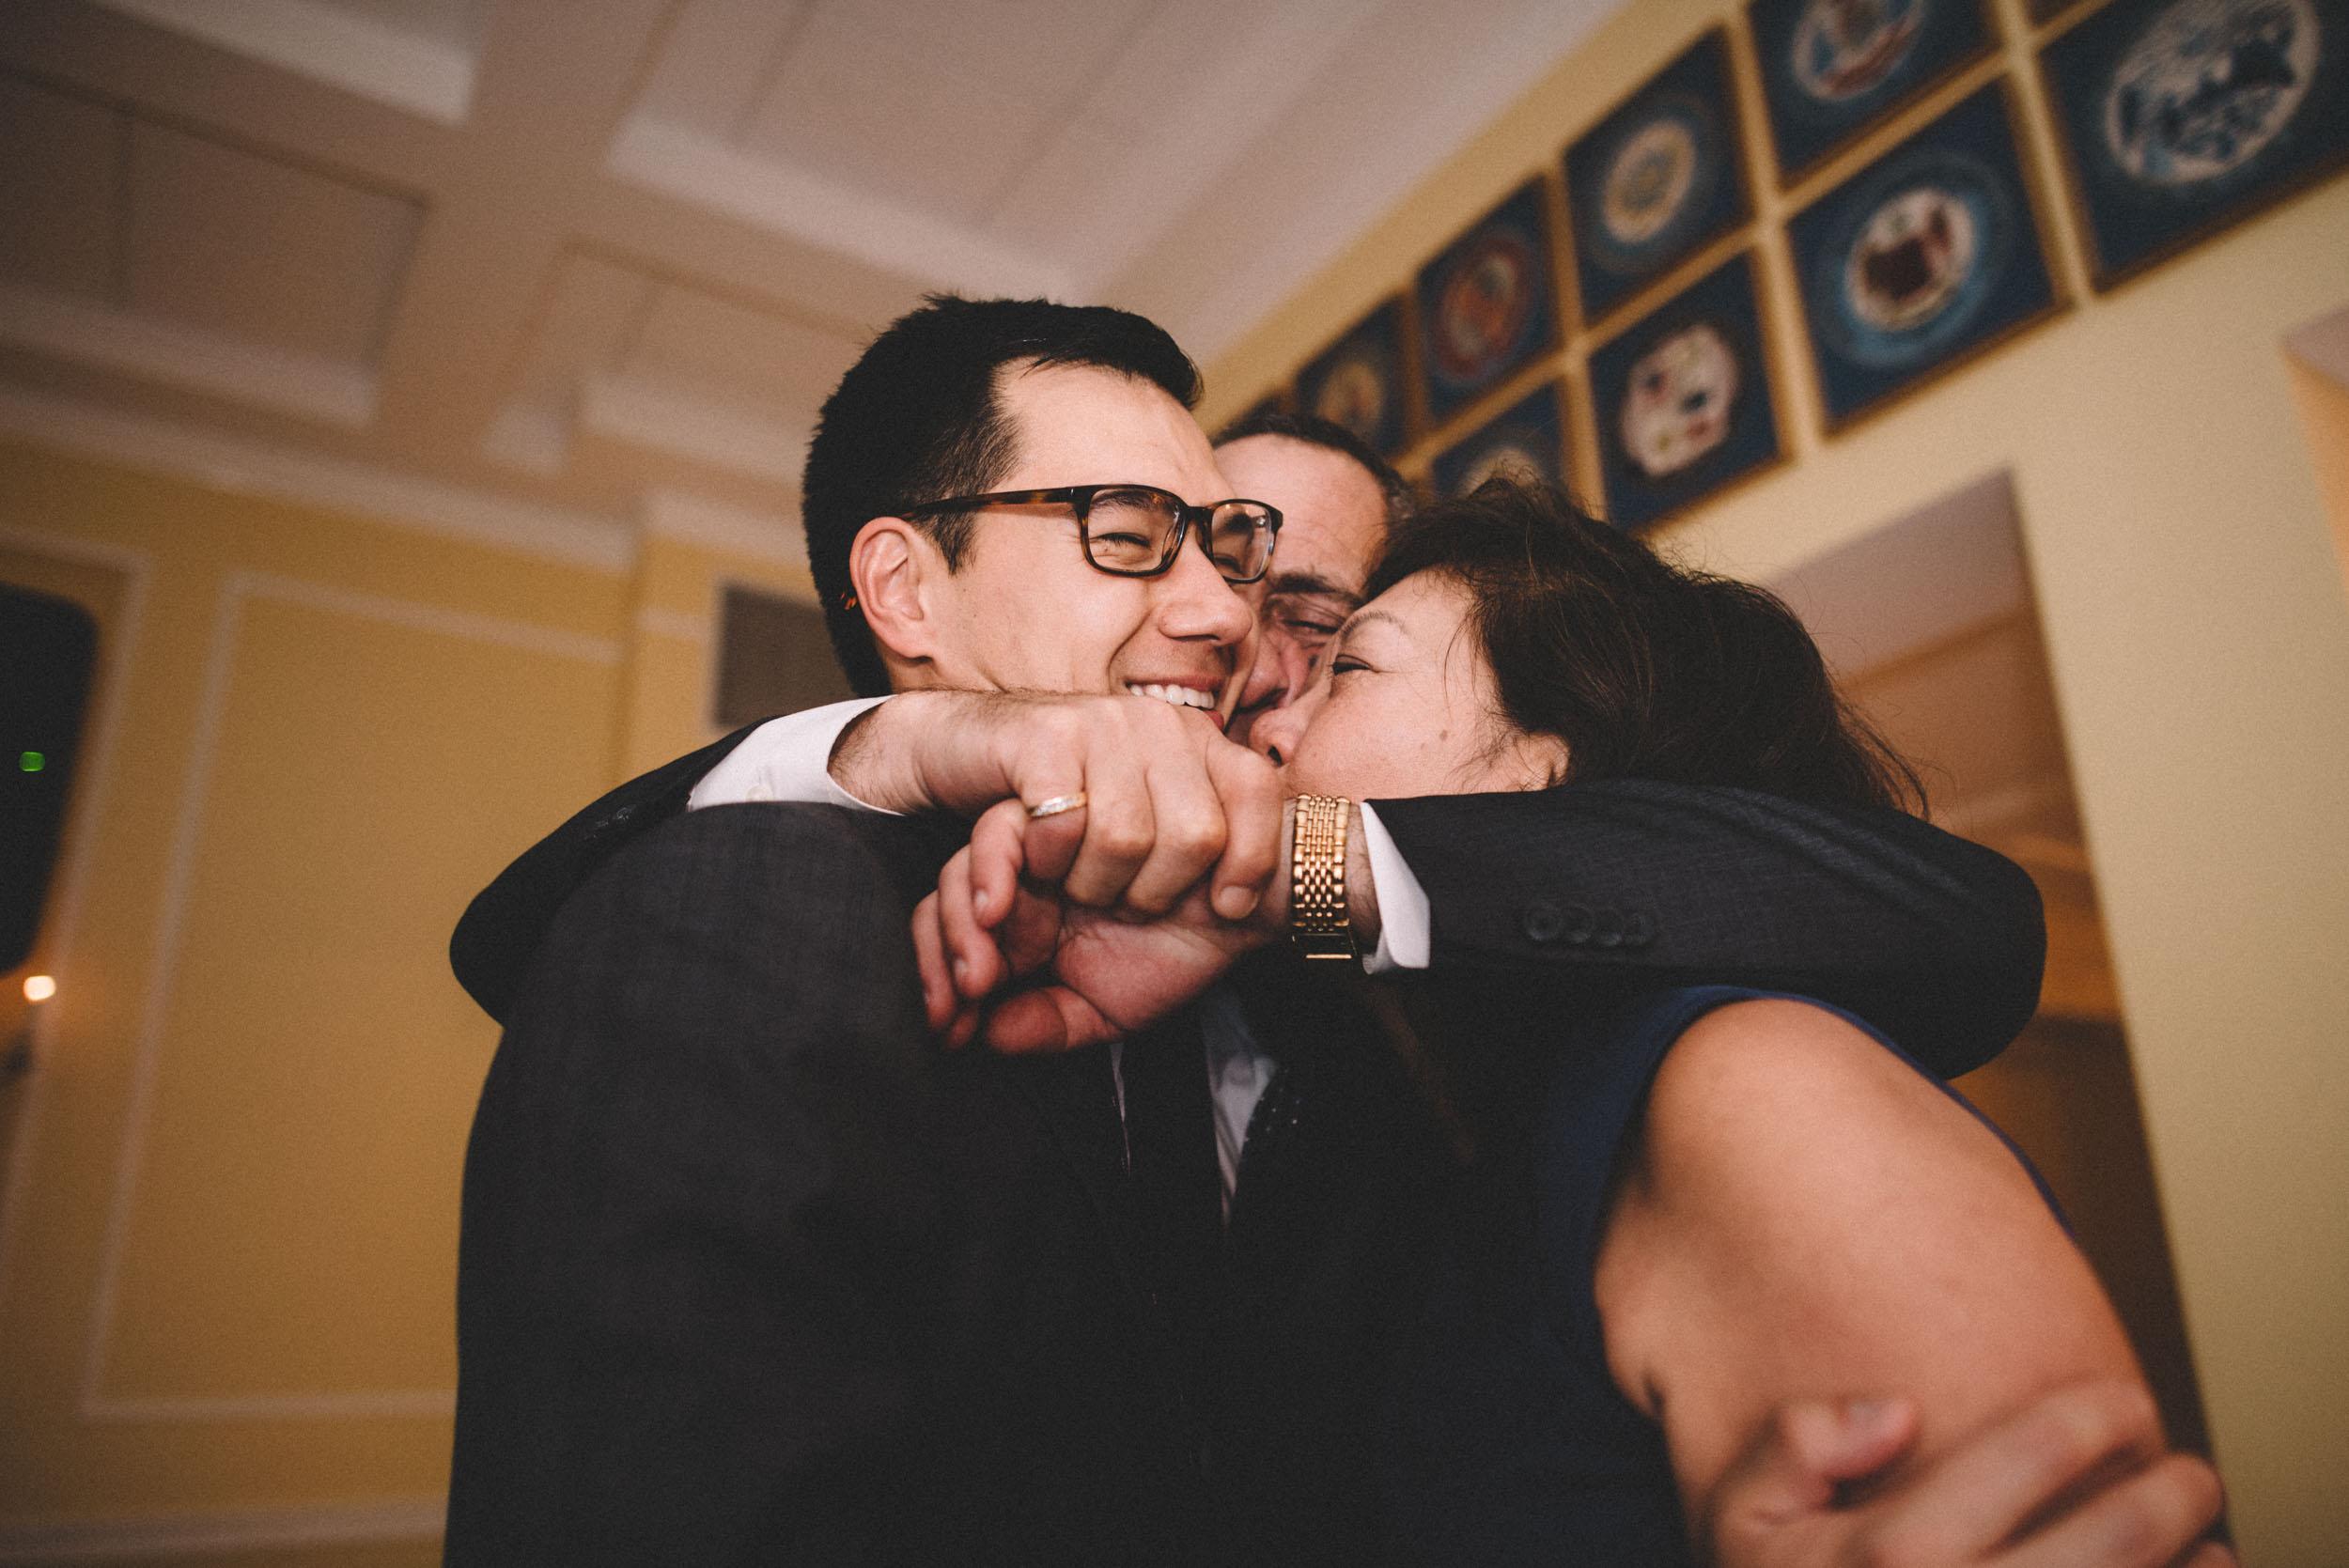 Dumbarton-House-wedding-104.jpg